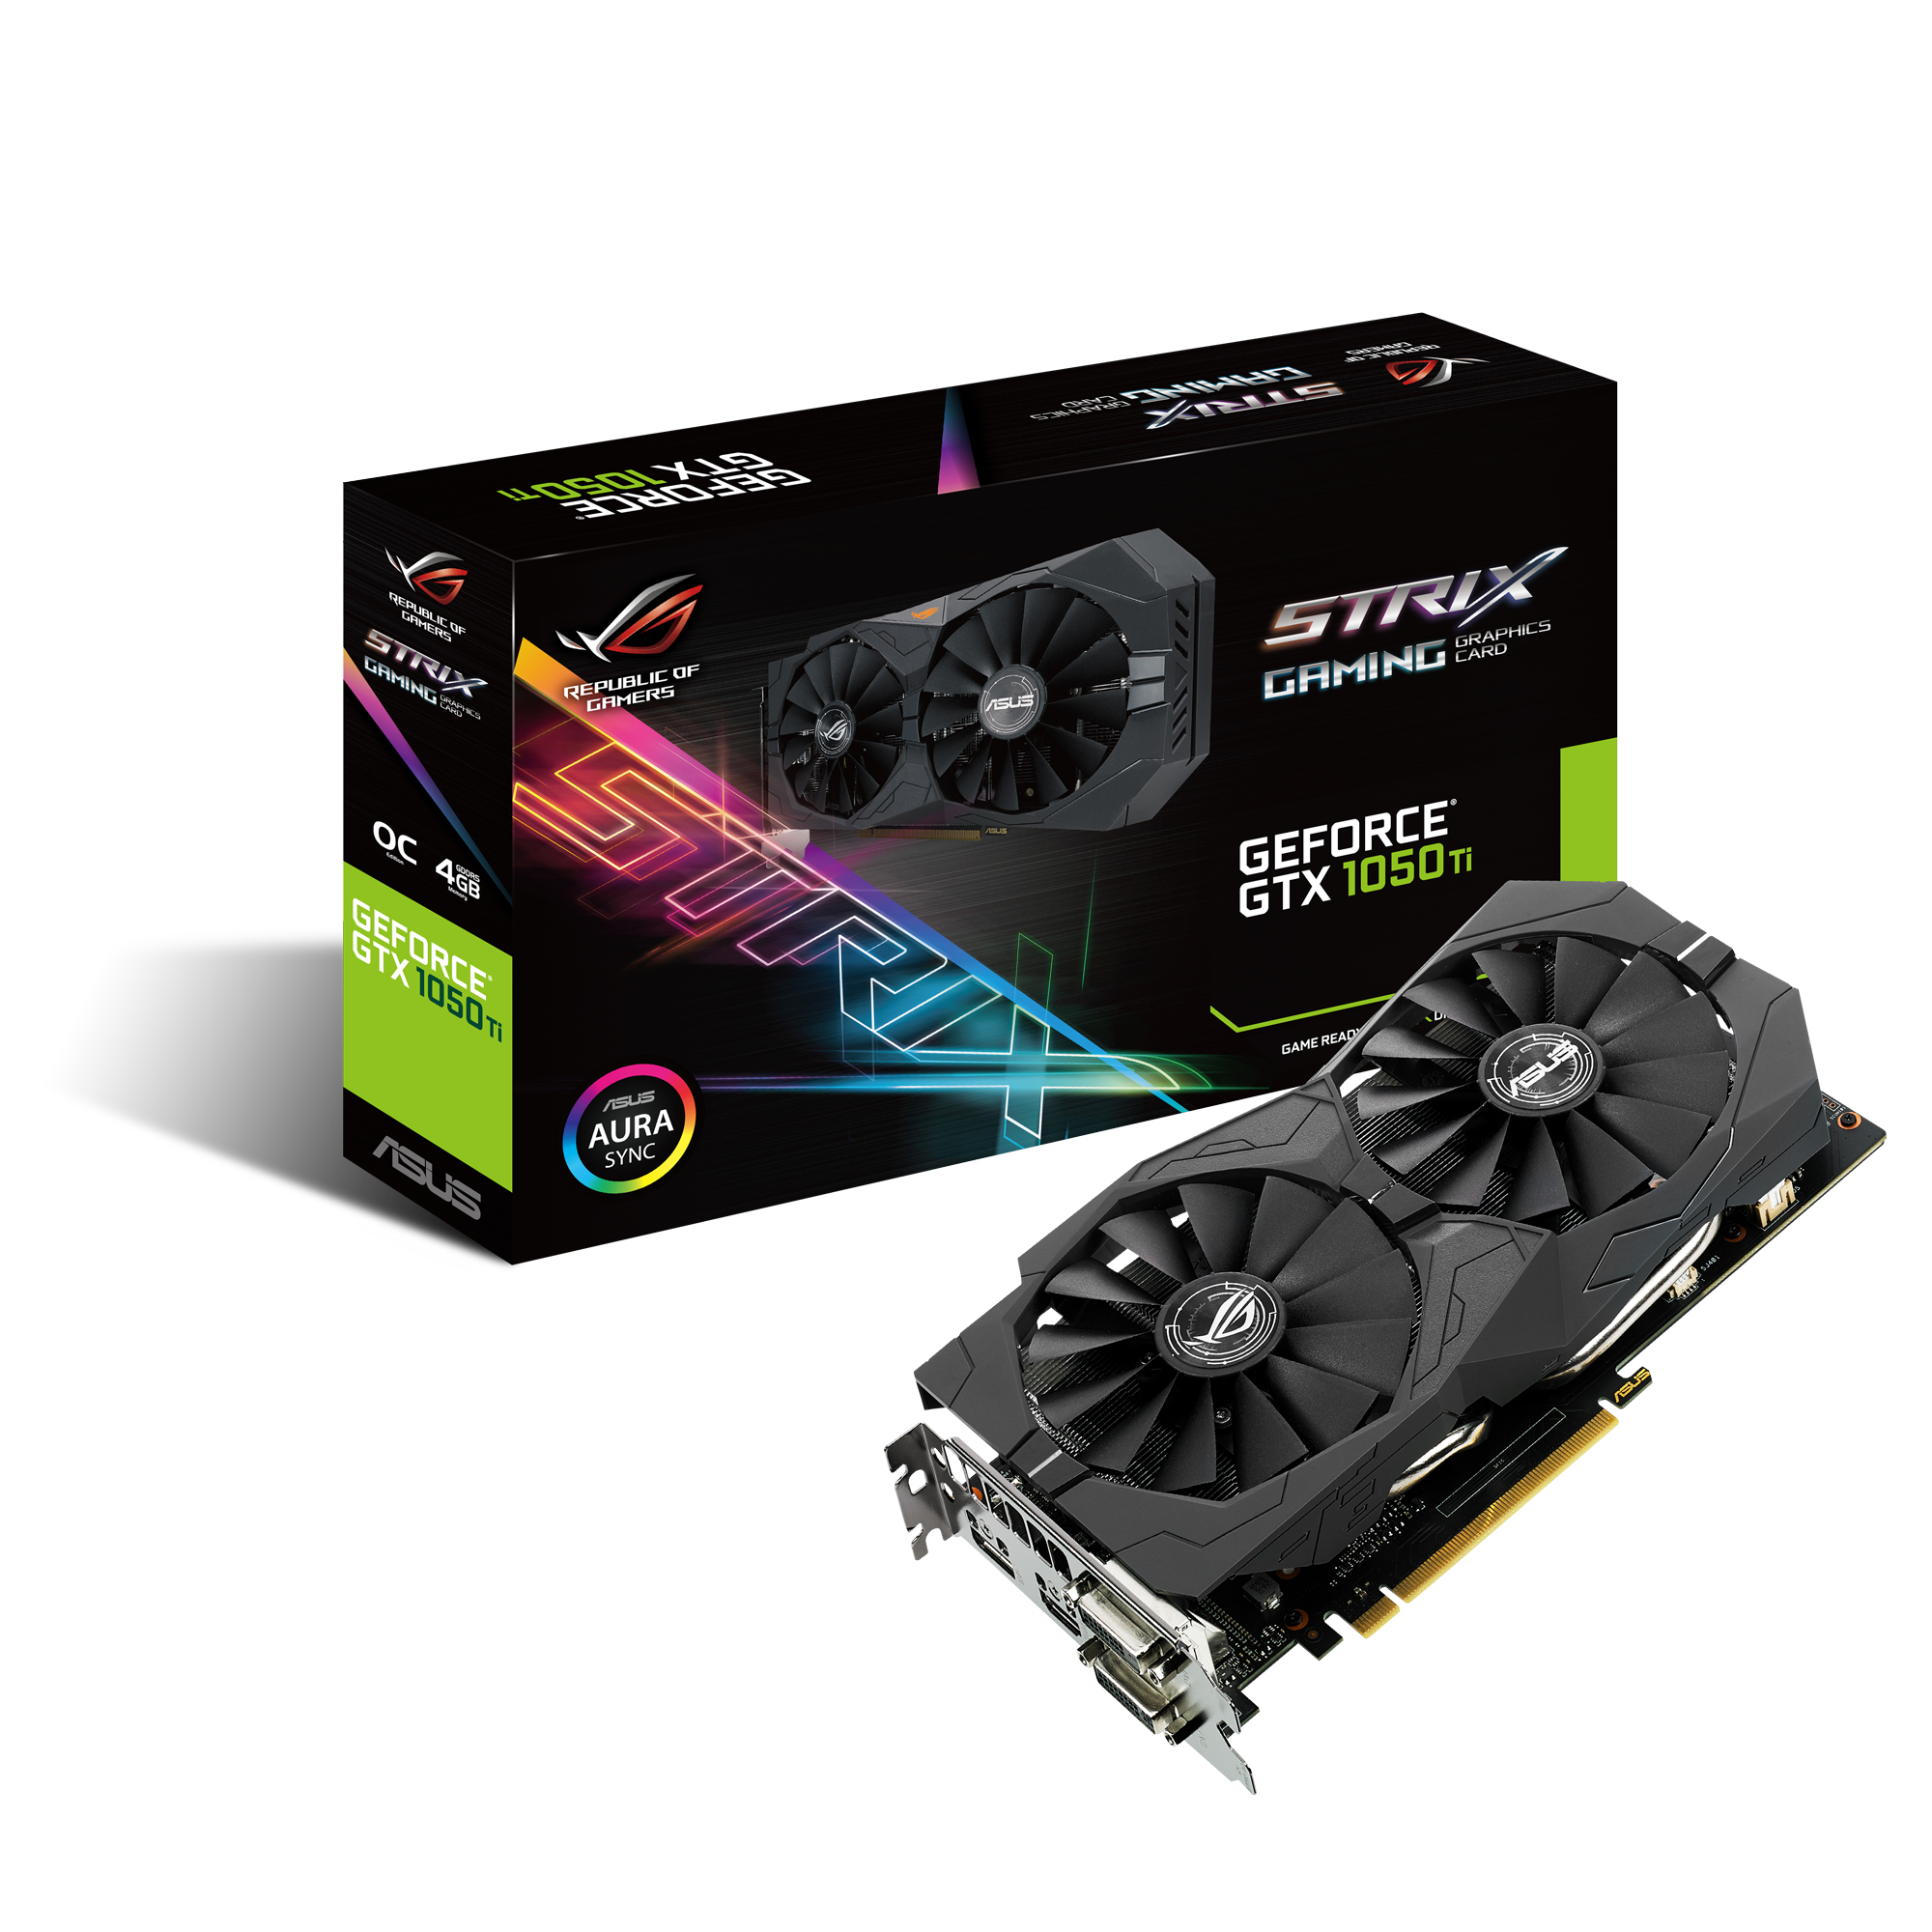 Placa Video ASUS ROG Strix Gaming GeForce GTX 1050Ti OC 4GB GDDR5 128 biti